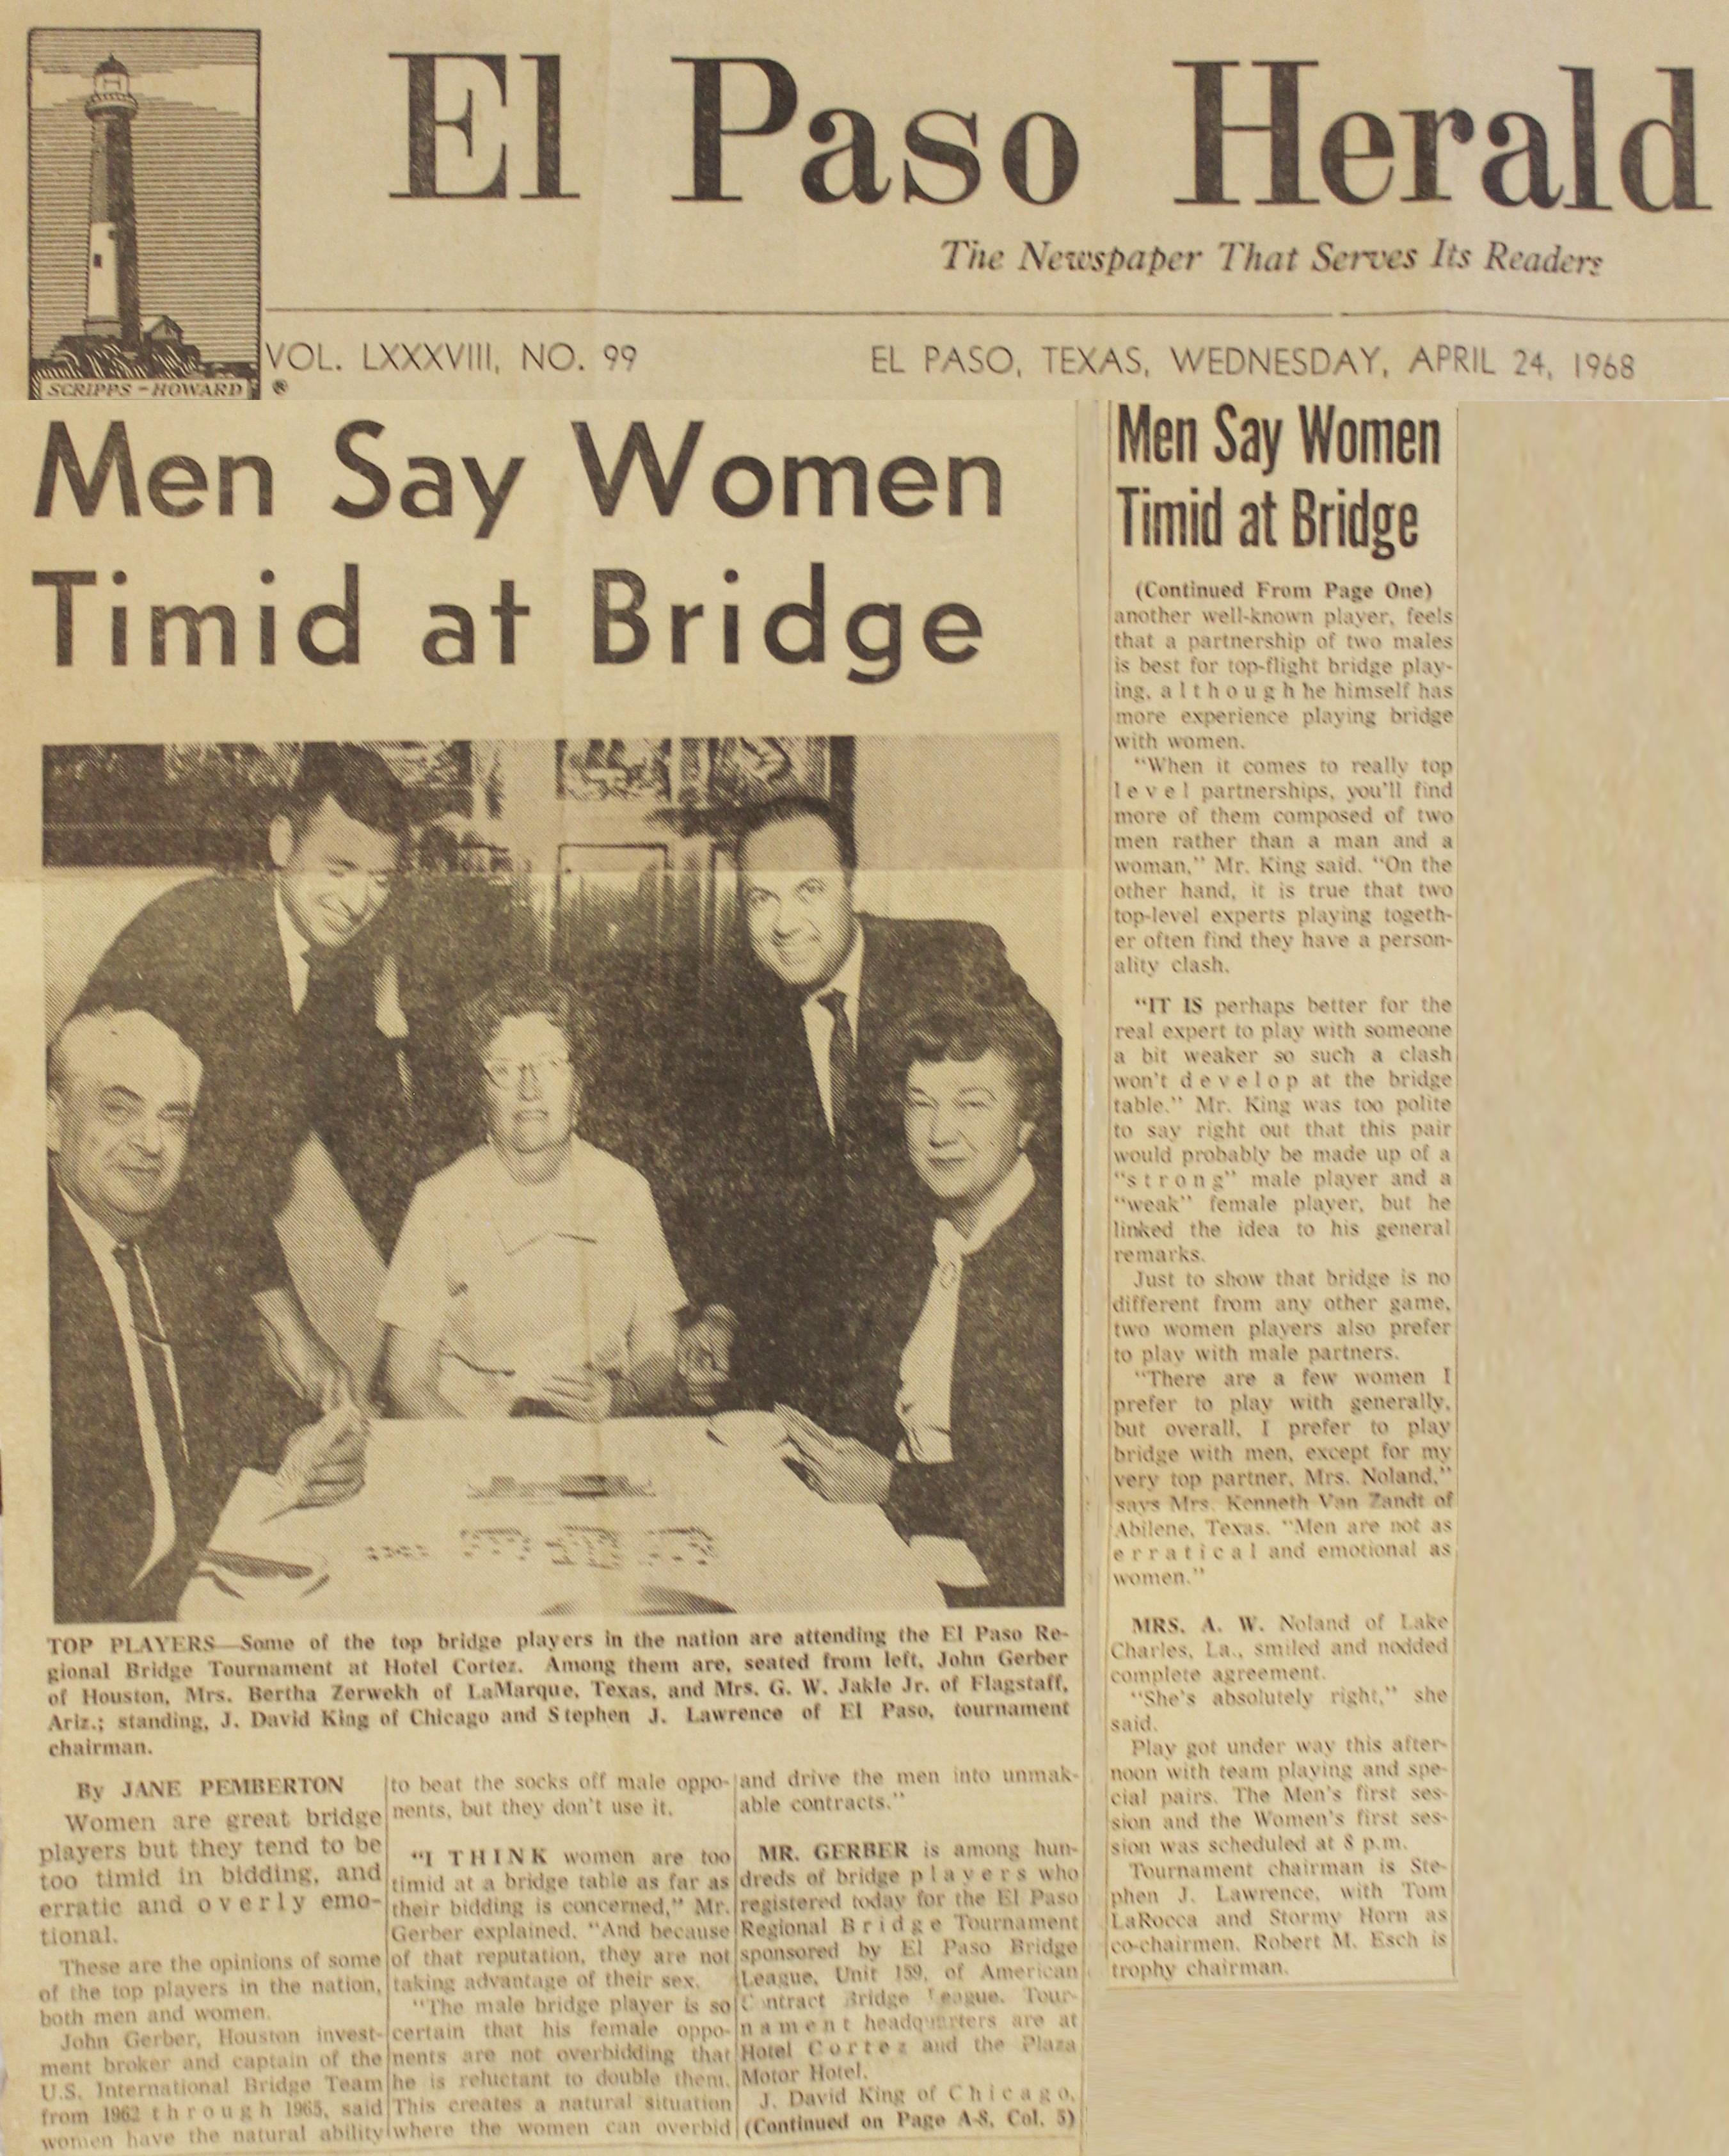 History with John Gerber 1968